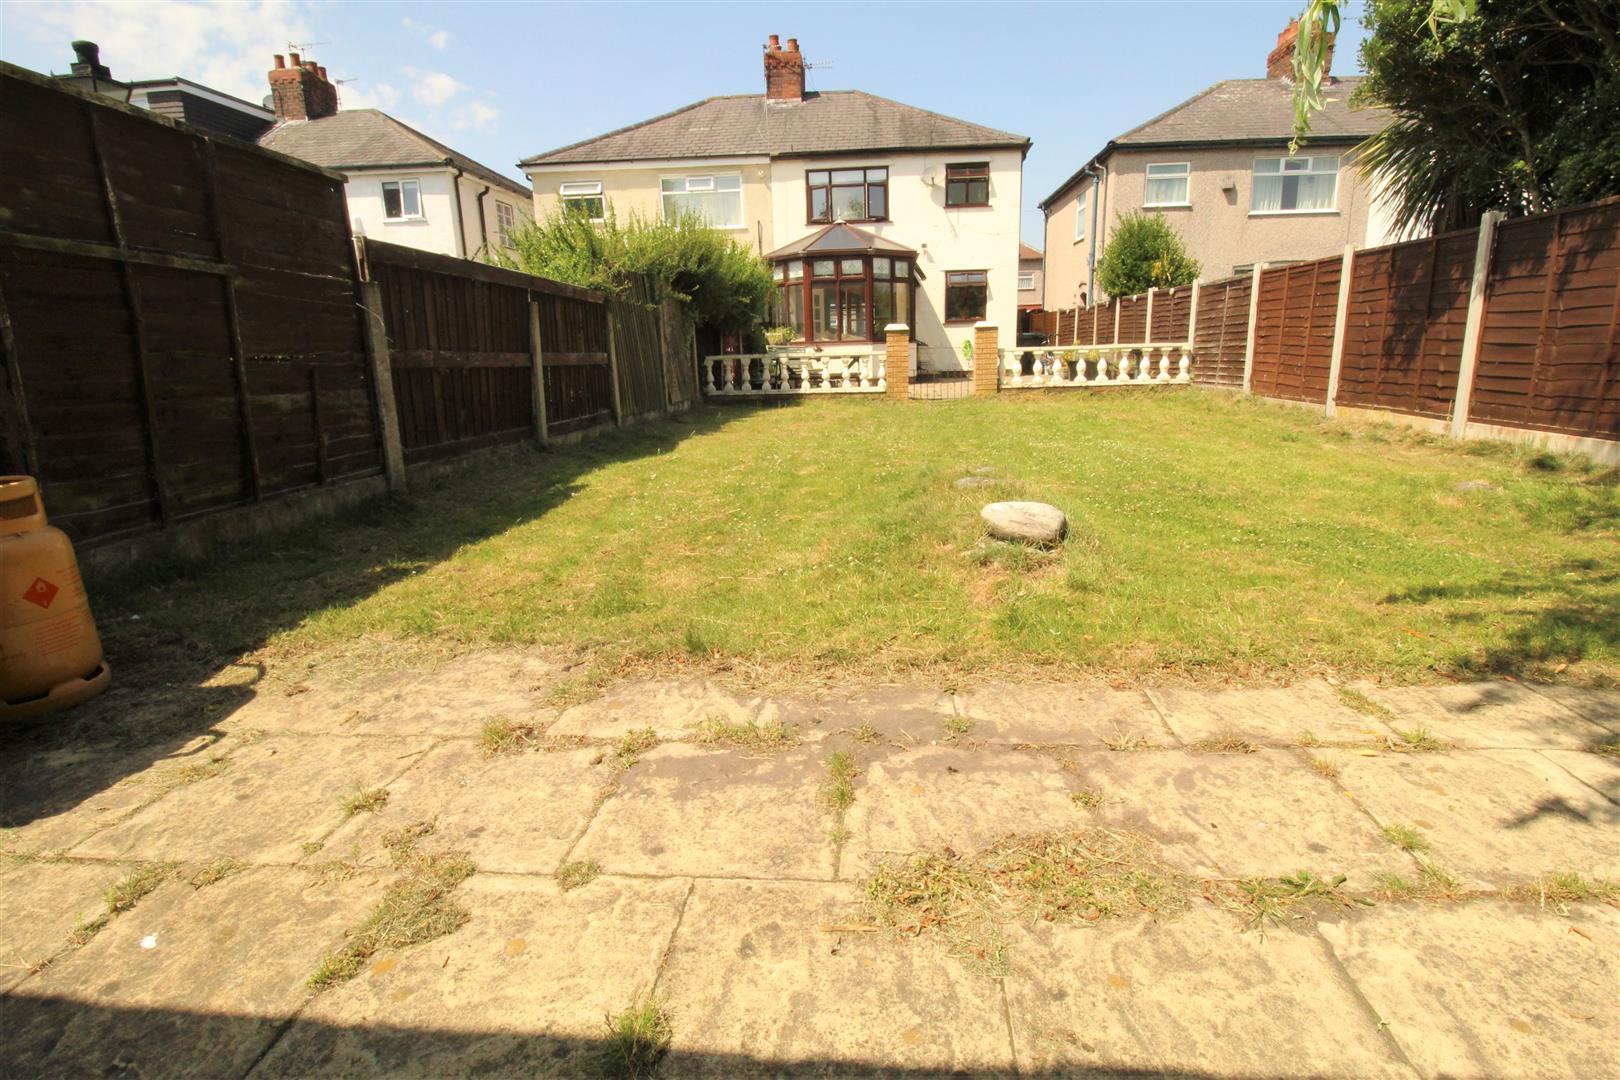 3 Bedrooms, House - Semi-Detached, Melling Road, Liverpool